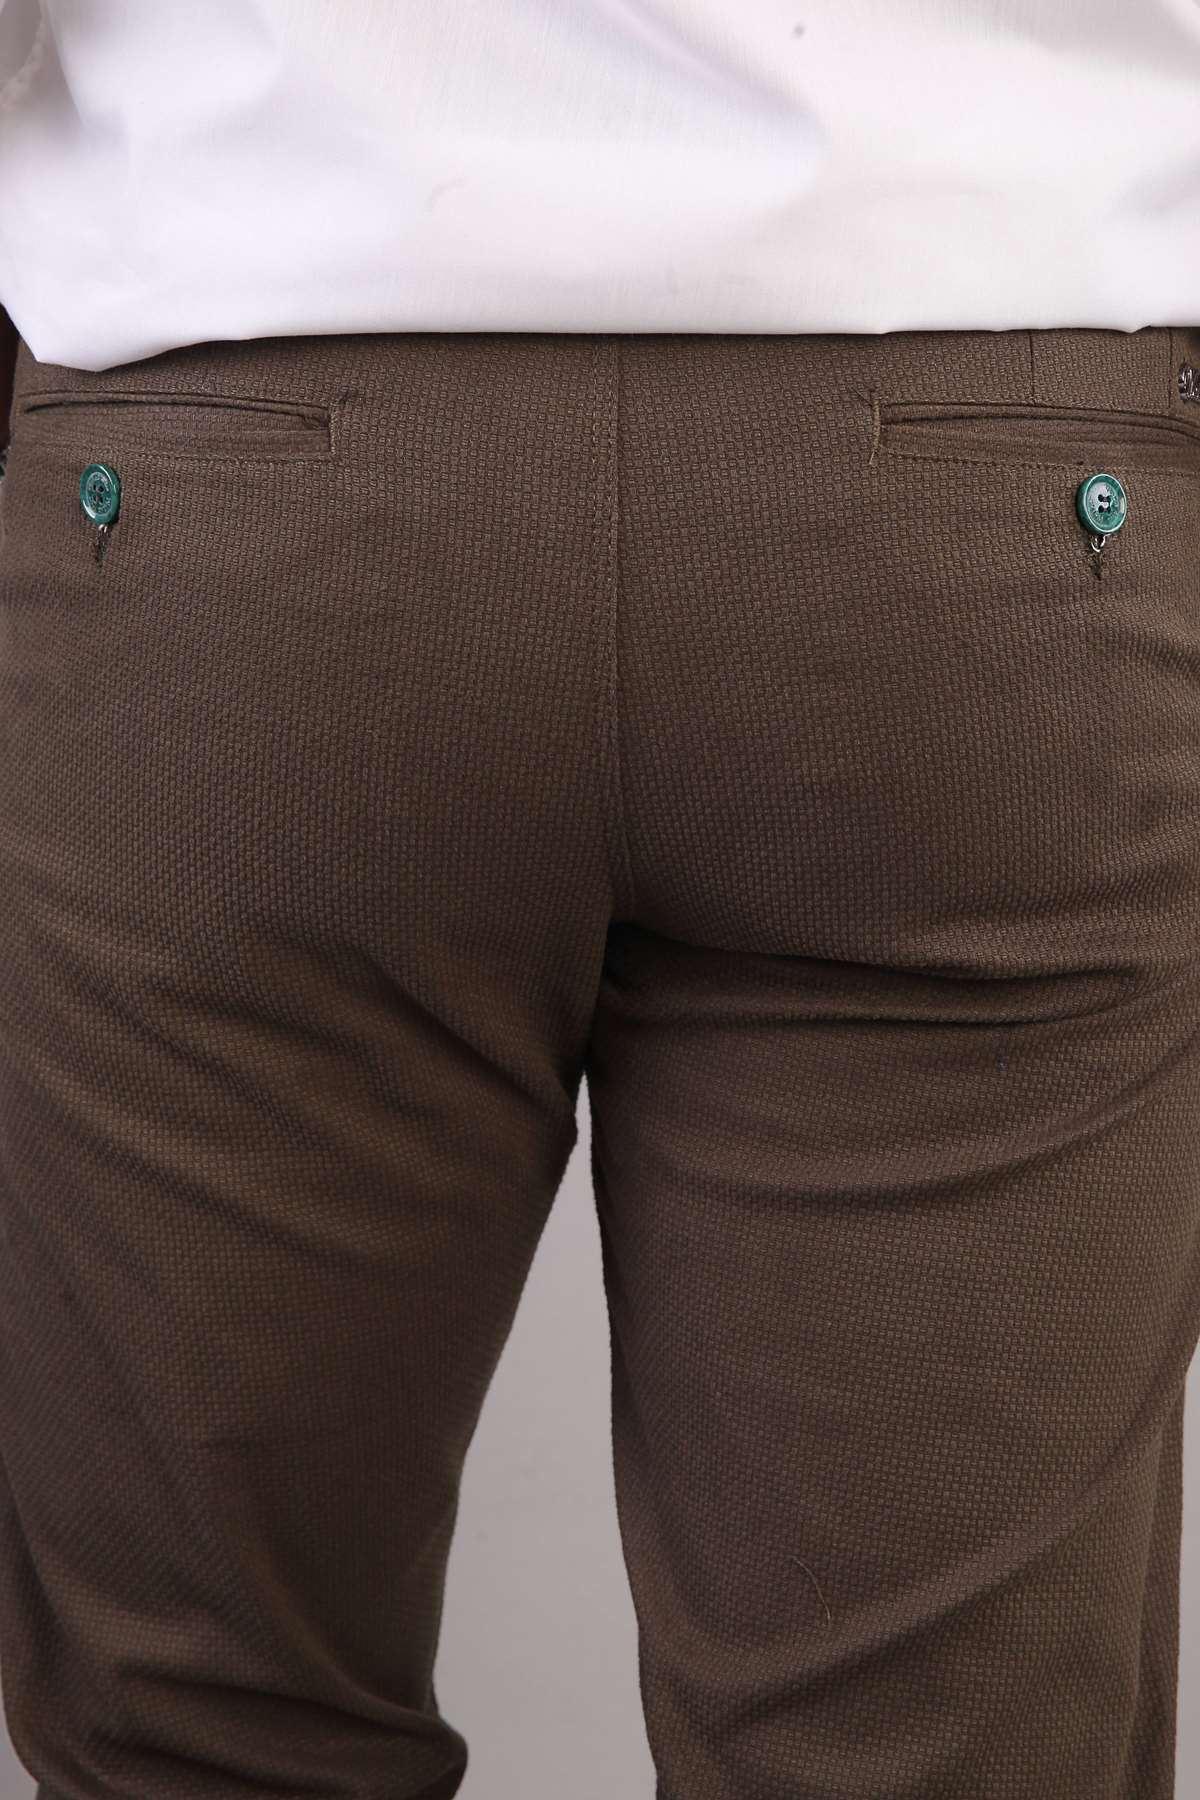 Petek Desenli Yan Cepli Slim Fit Pantolon Haki